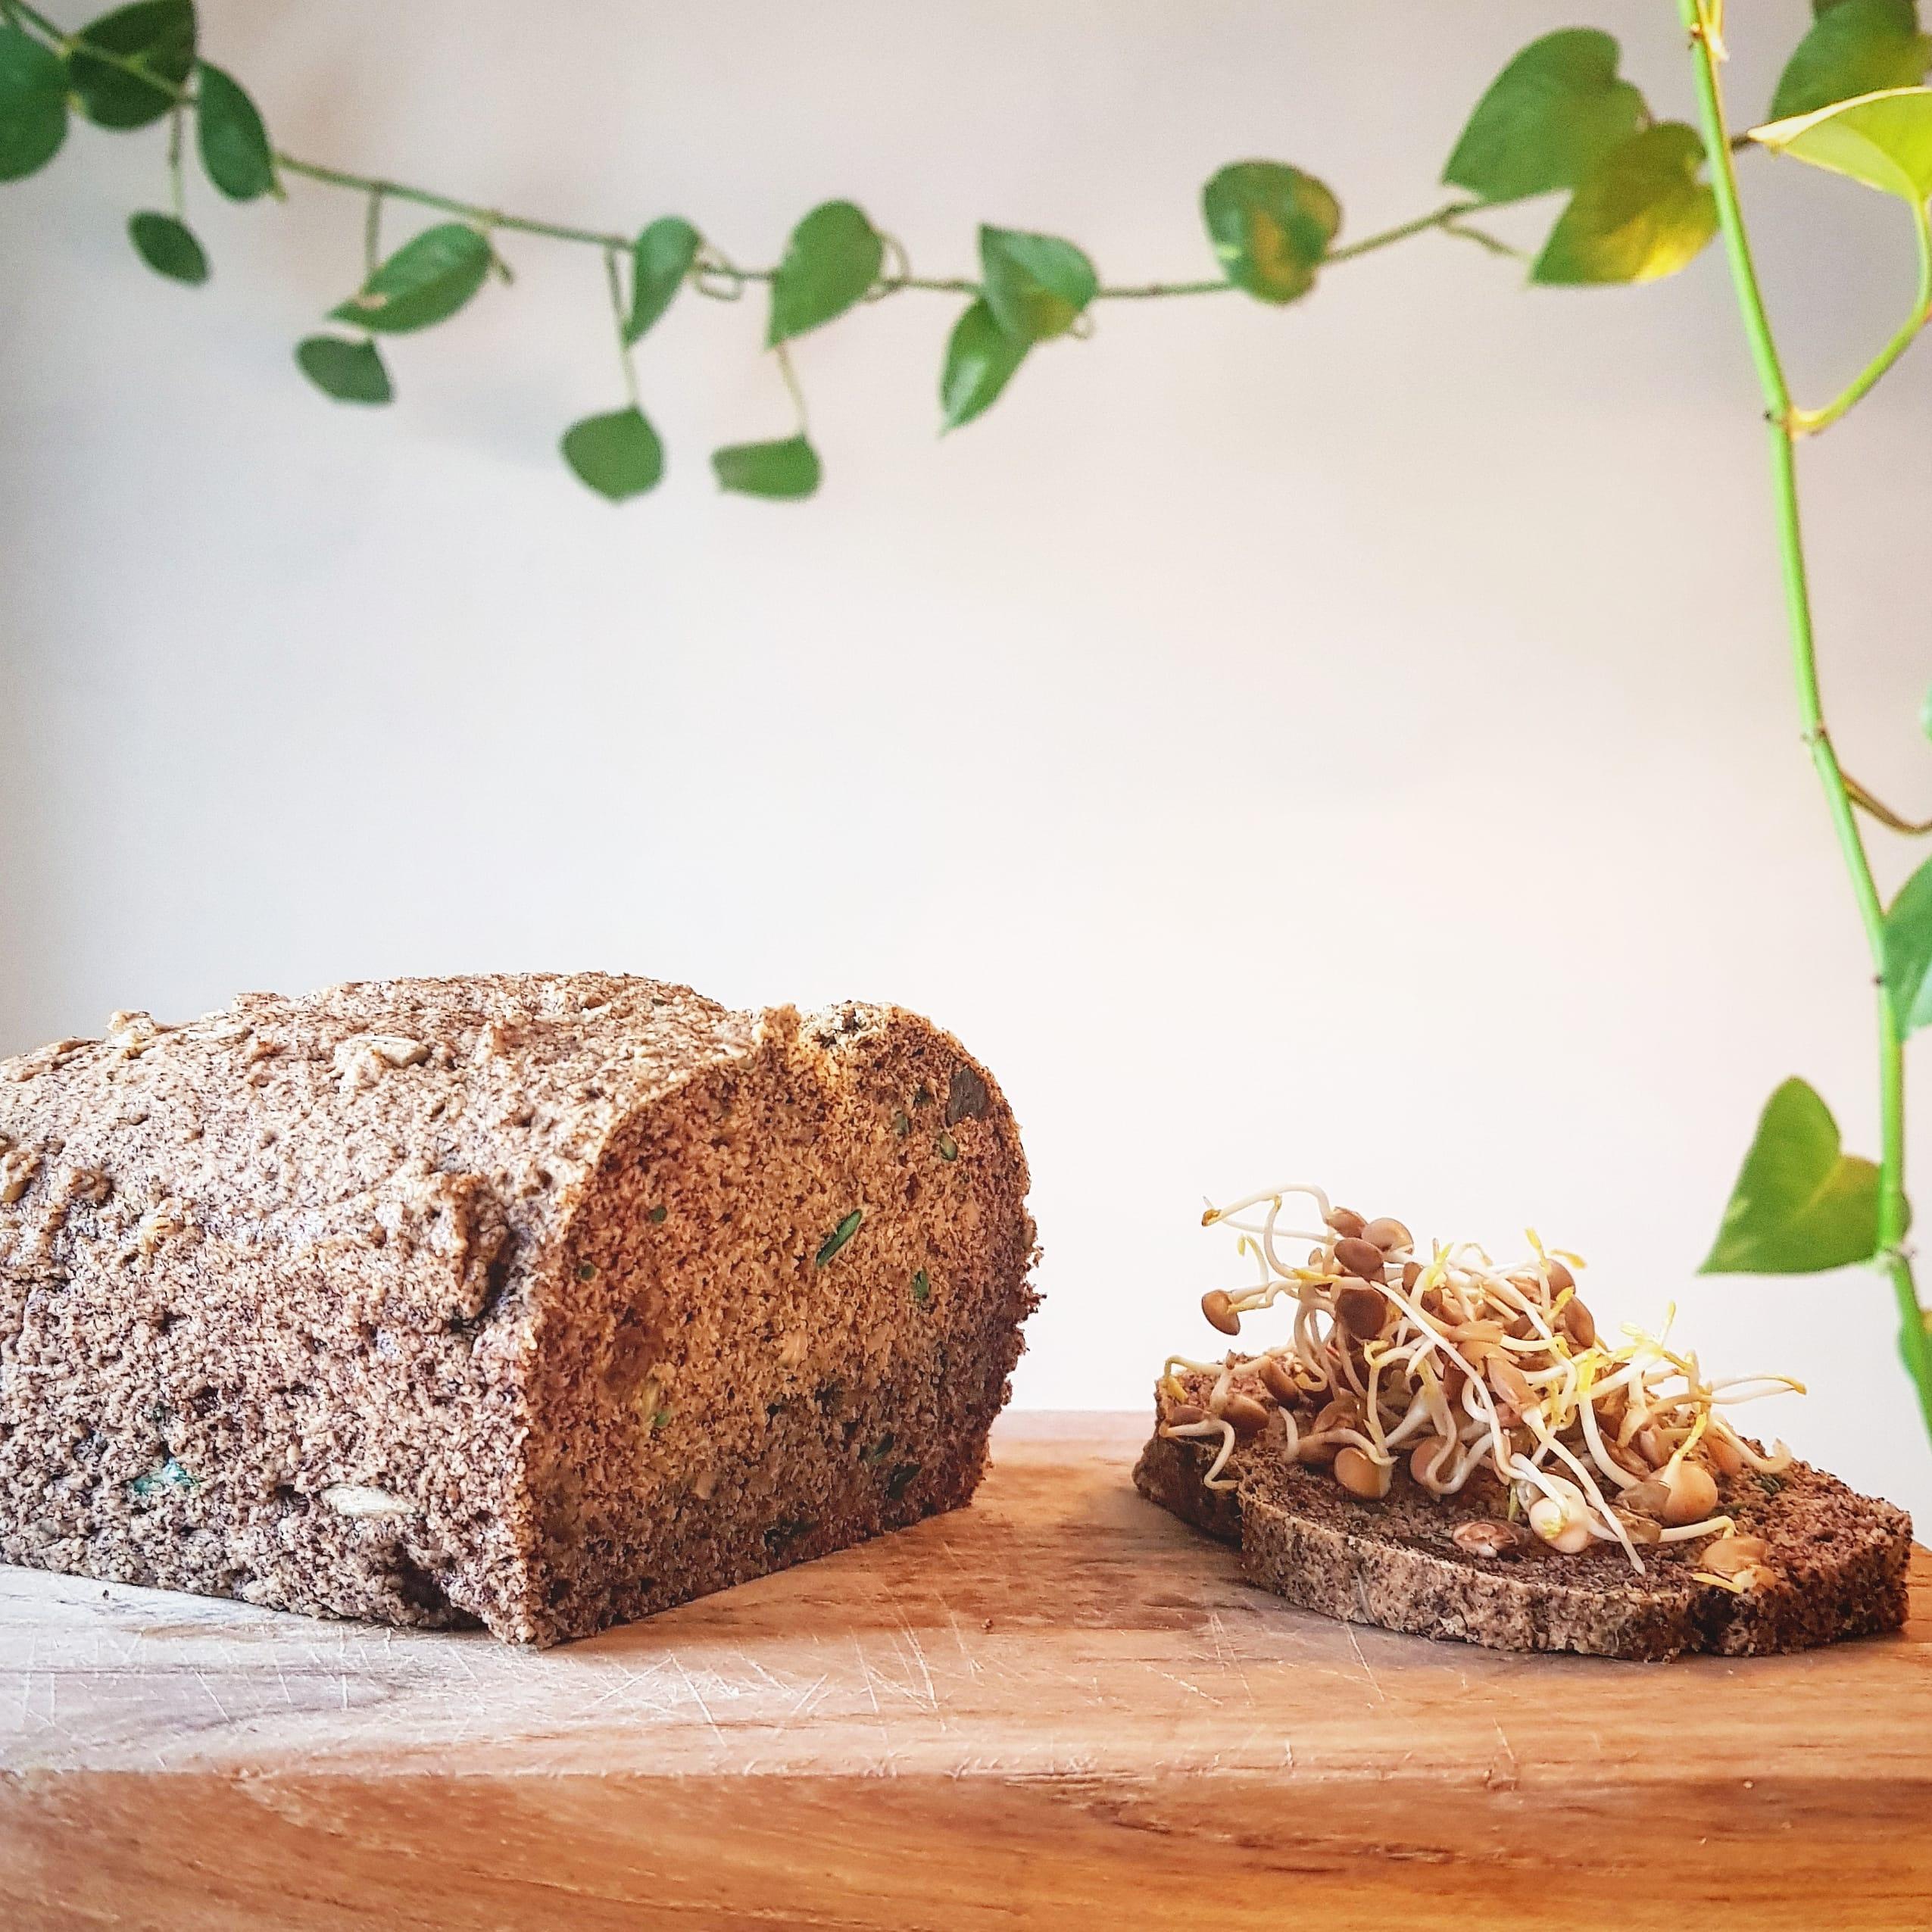 Eva's Glutenfria Groddade bröd